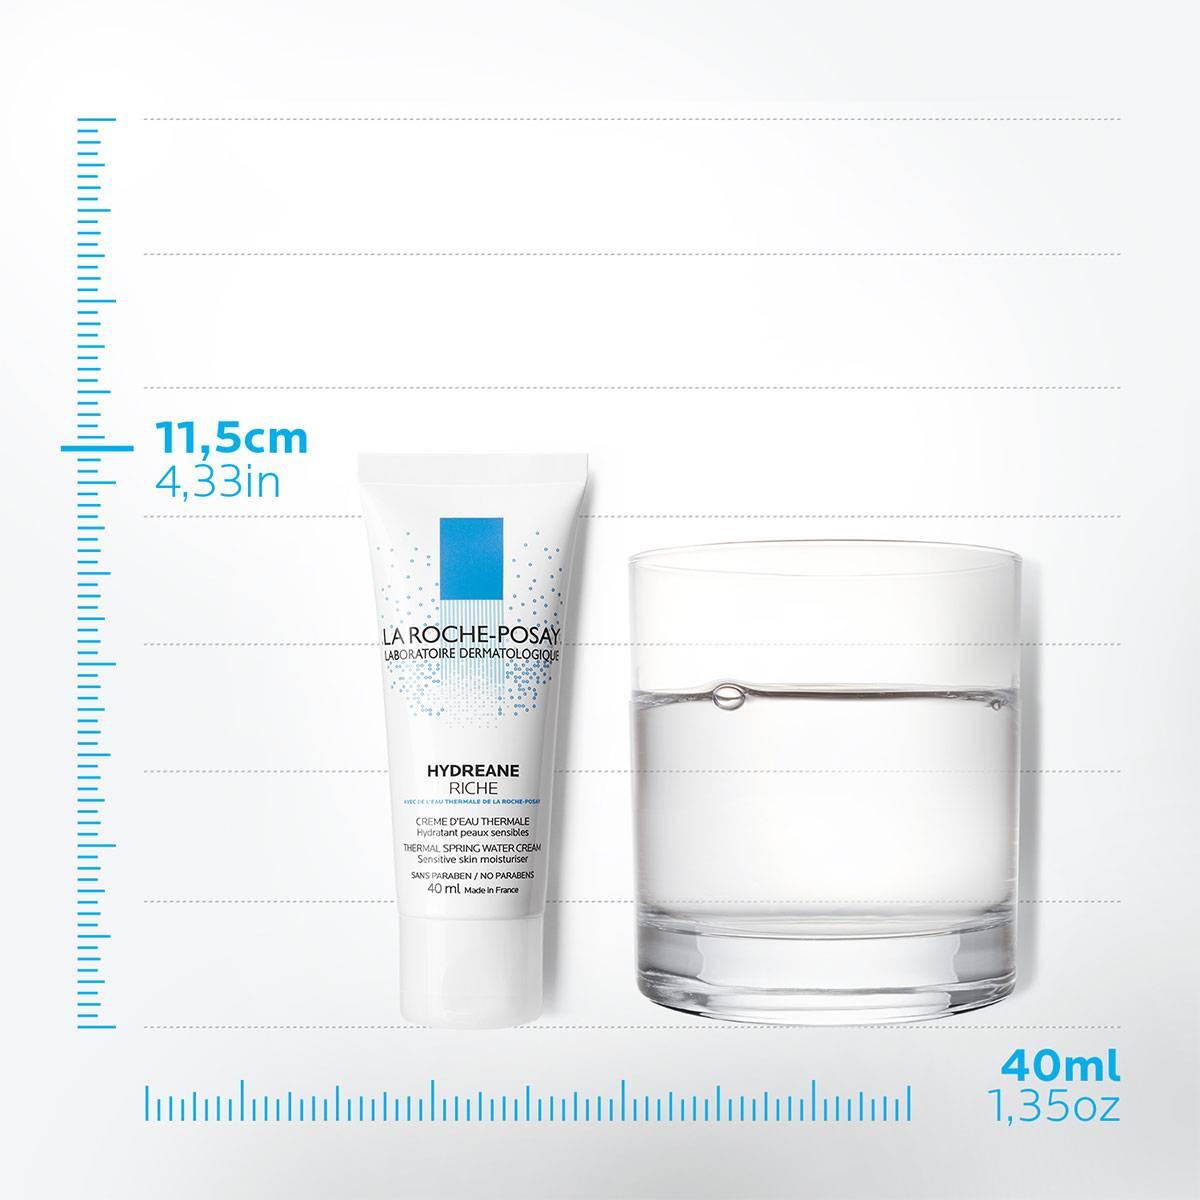 Hydreane Rich 40 ml | La Roche Posay